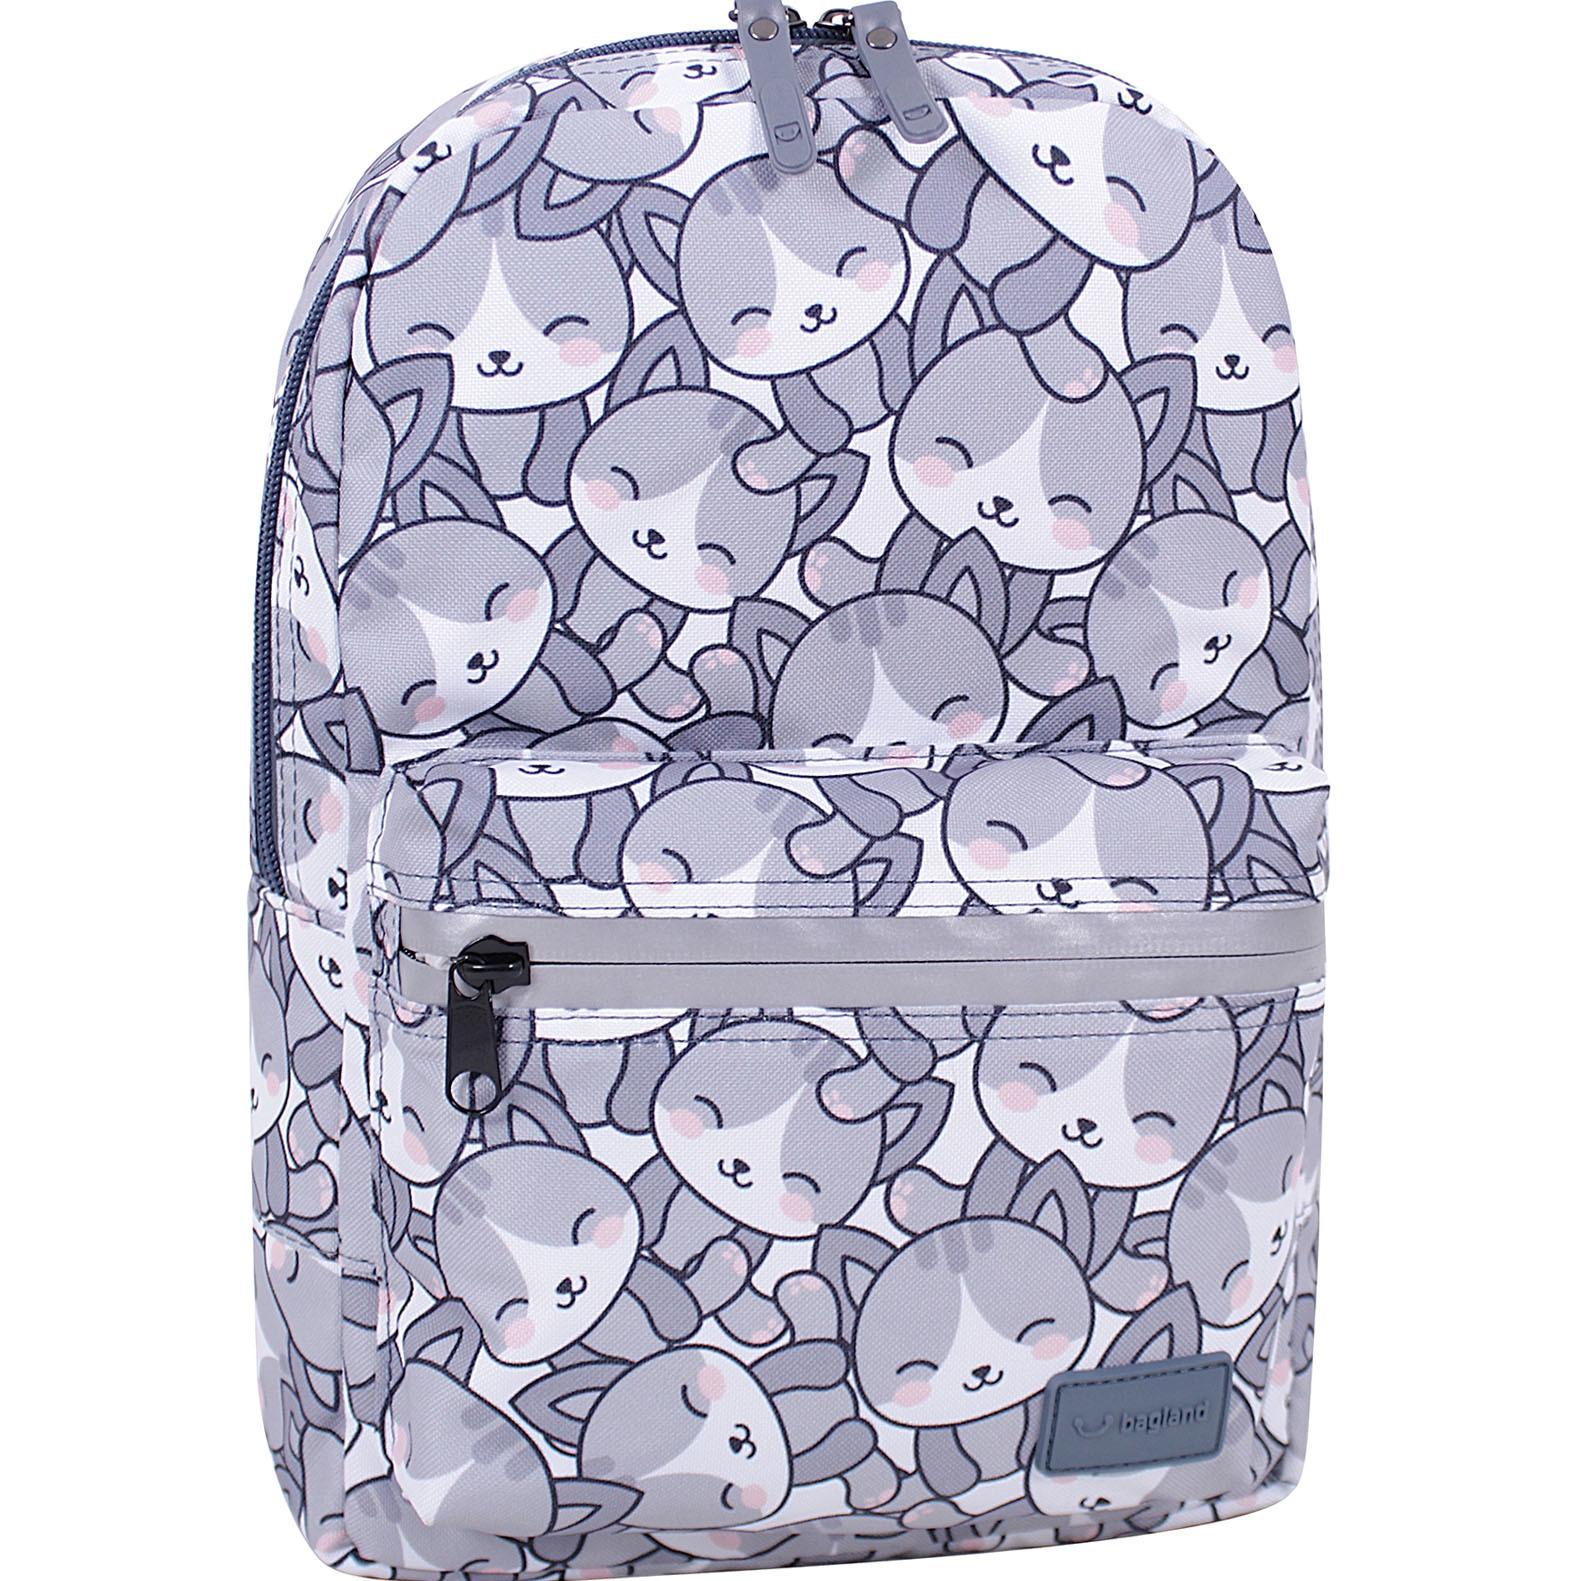 Молодежные рюкзаки Рюкзак Bagland Молодежный mini 8 л. сублимация 756 (00508664) IMG_1280суб.756.JPG